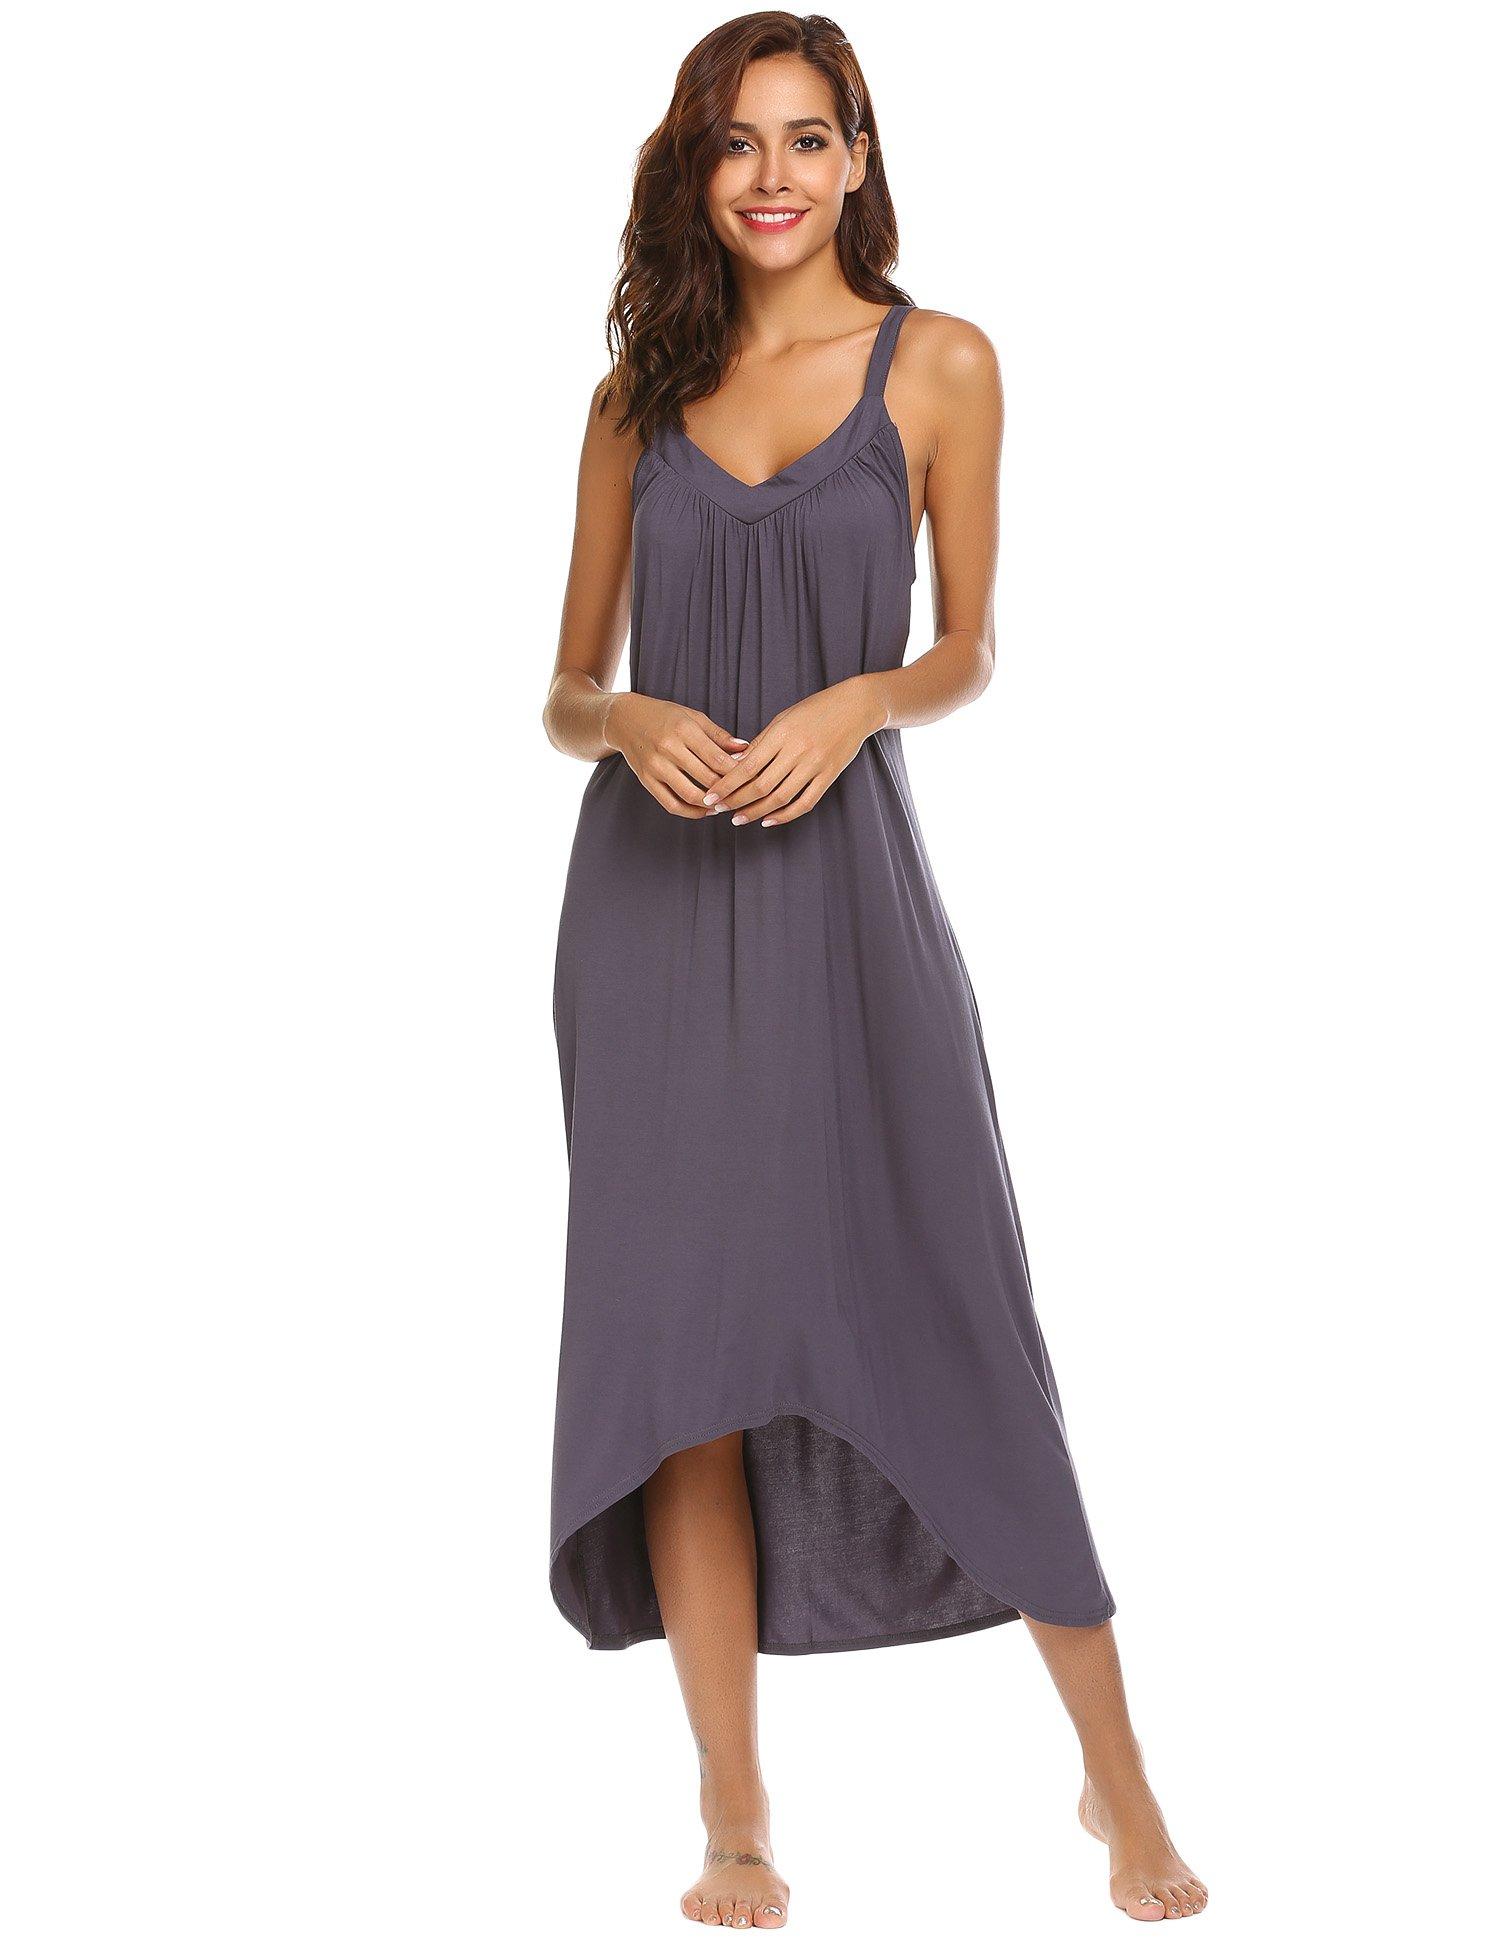 Ekouaer Womens Sleeveless Long Nightgown Summer Slip Night Dress Cotton Sleepshirt Chemise,A-dark Grey_6696,Small by Ekouaer (Image #2)